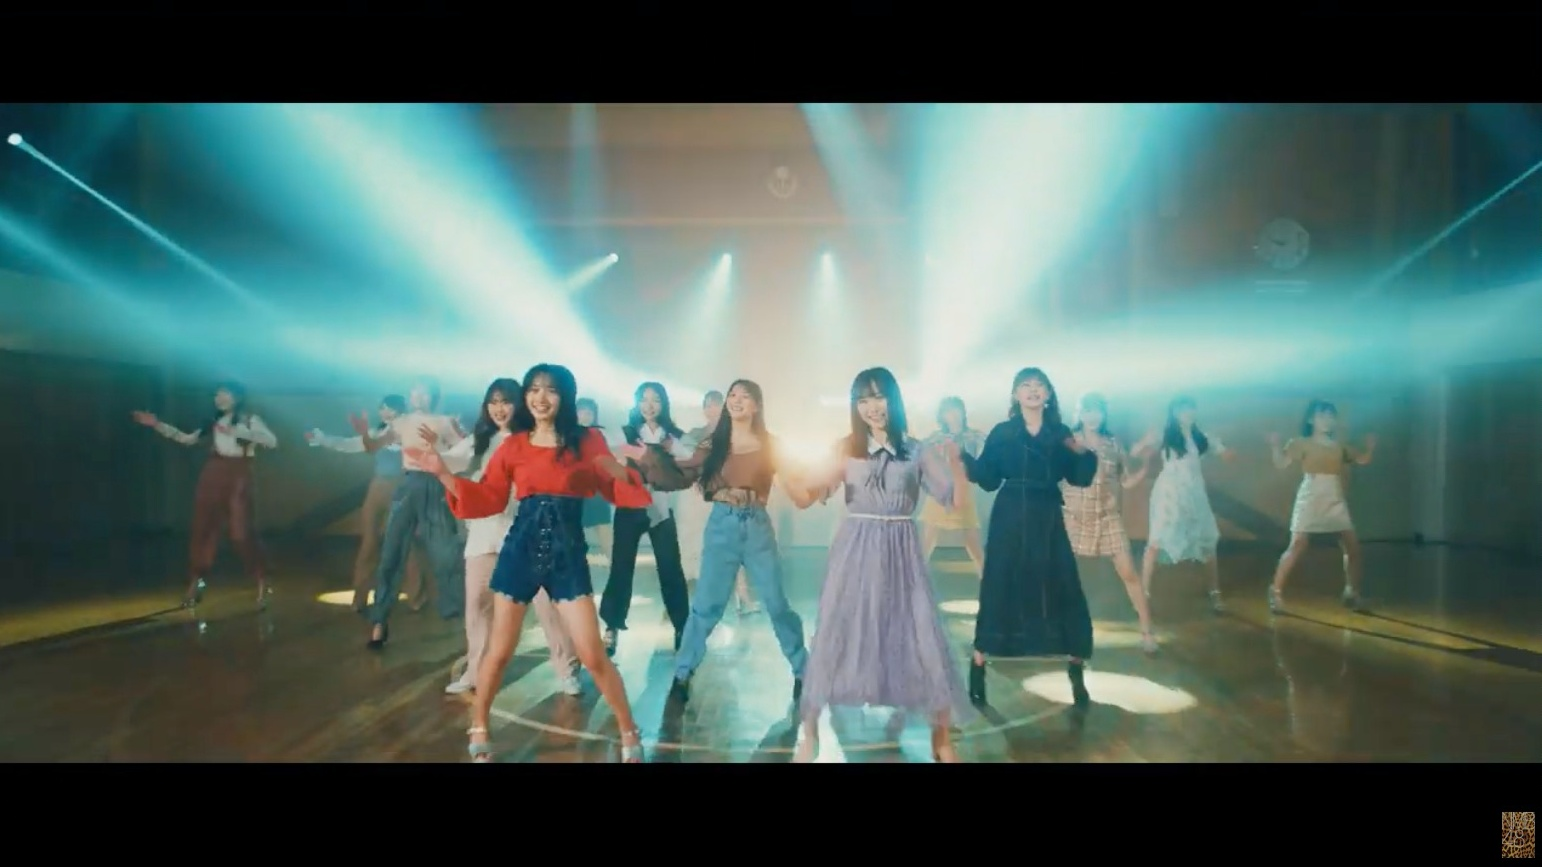 【NMB48】23rdシングル「だってだってだって」ミュージックビデオがYou Tubeで公開